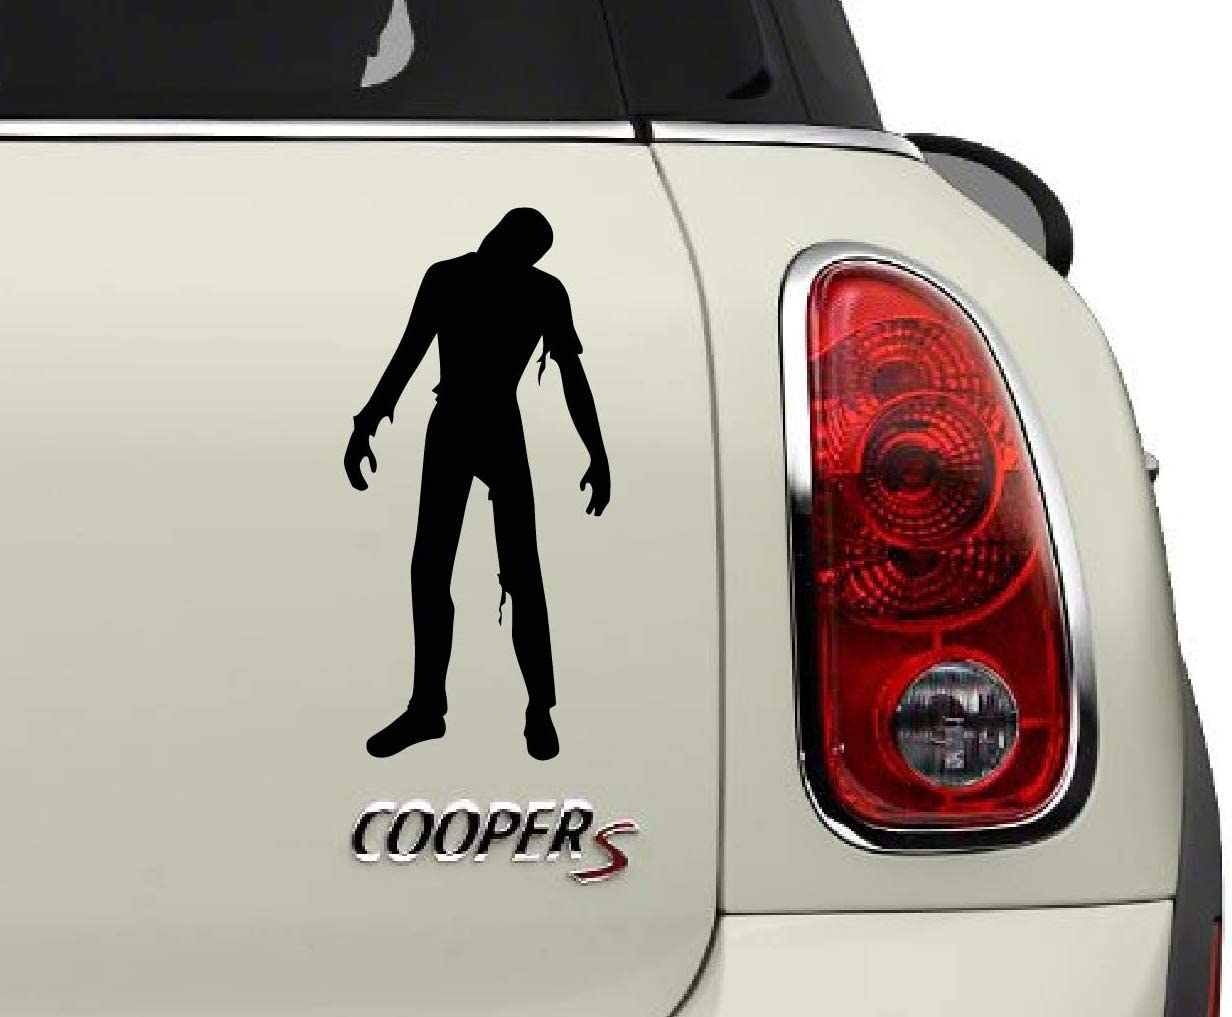 SCI-FI/Comics/Games Decals Zombie Automotive Decal/Bumper Sticker